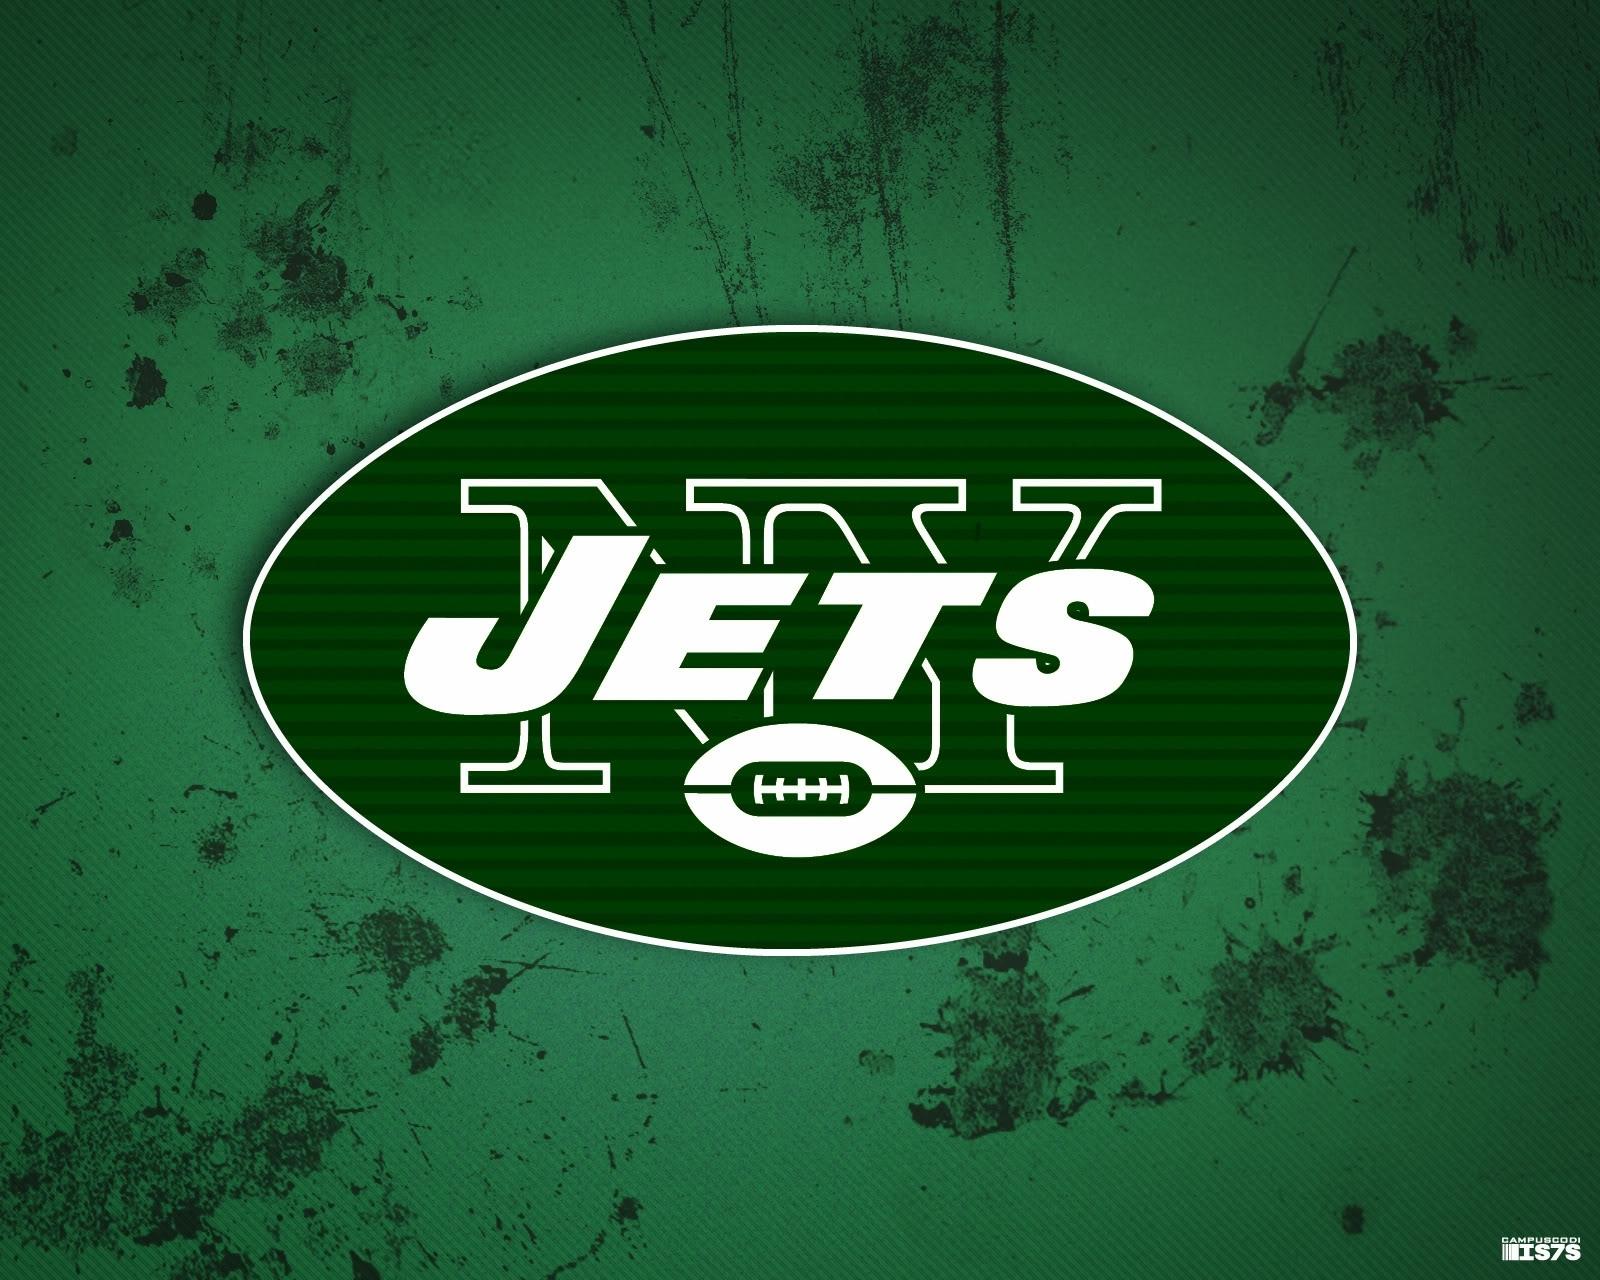 new york jets logo nfl wallpaper hd | nfl wallpaper | pinterest